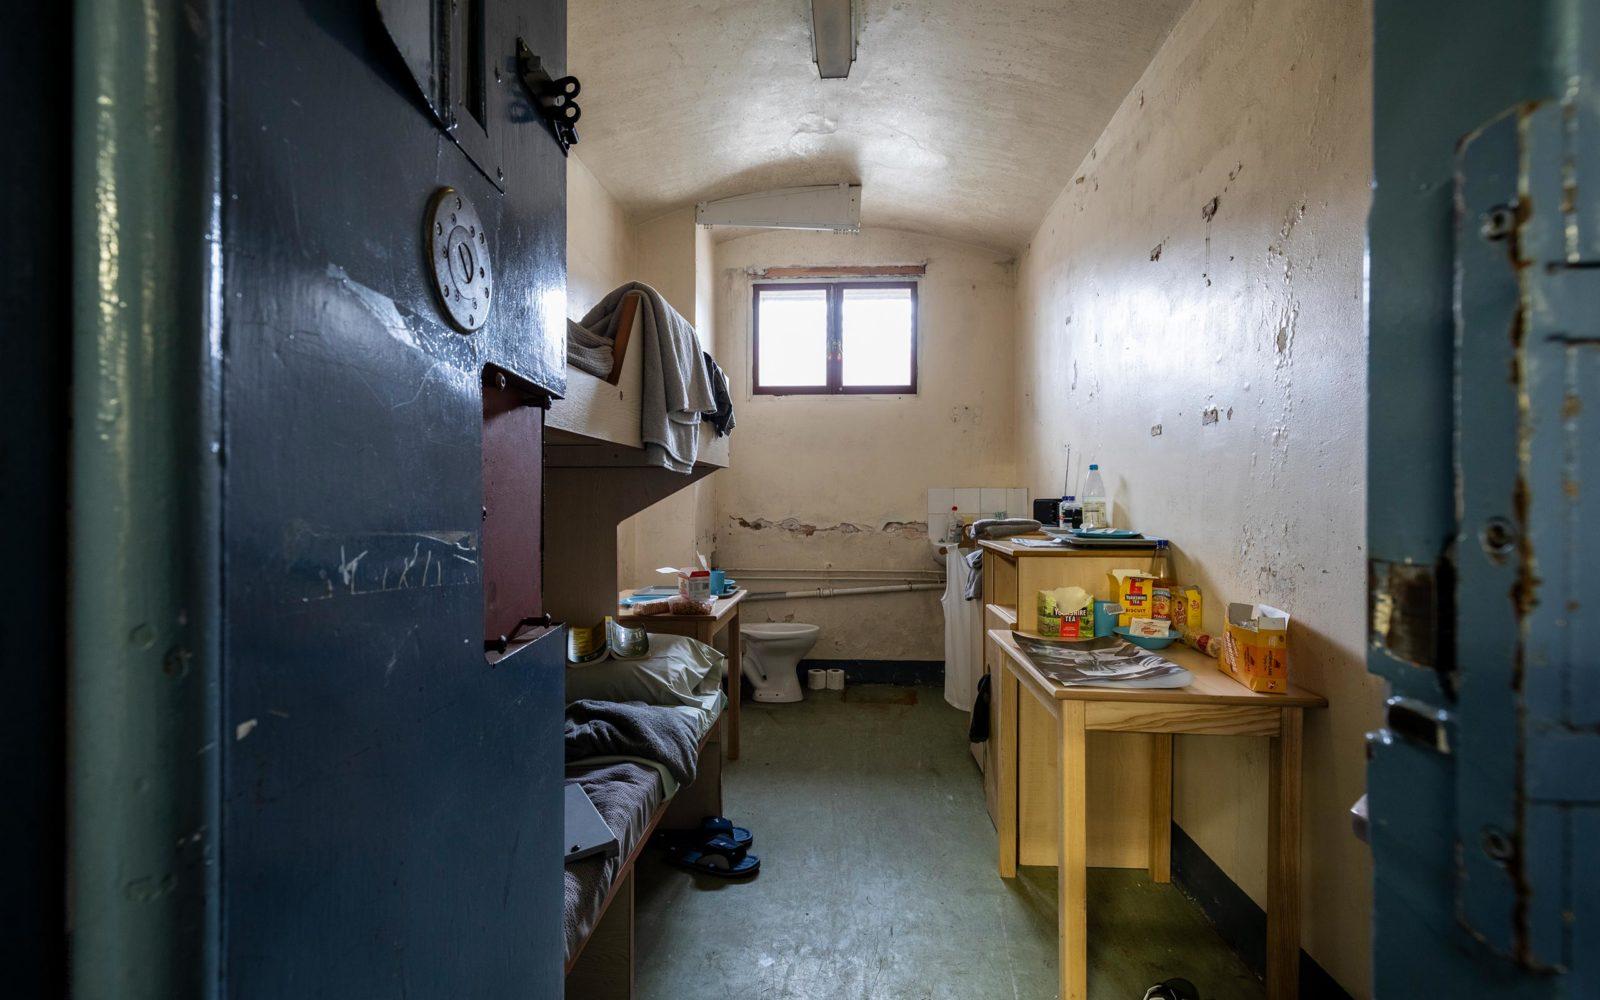 Shrewsbury Prison Charity & Recreational Trips